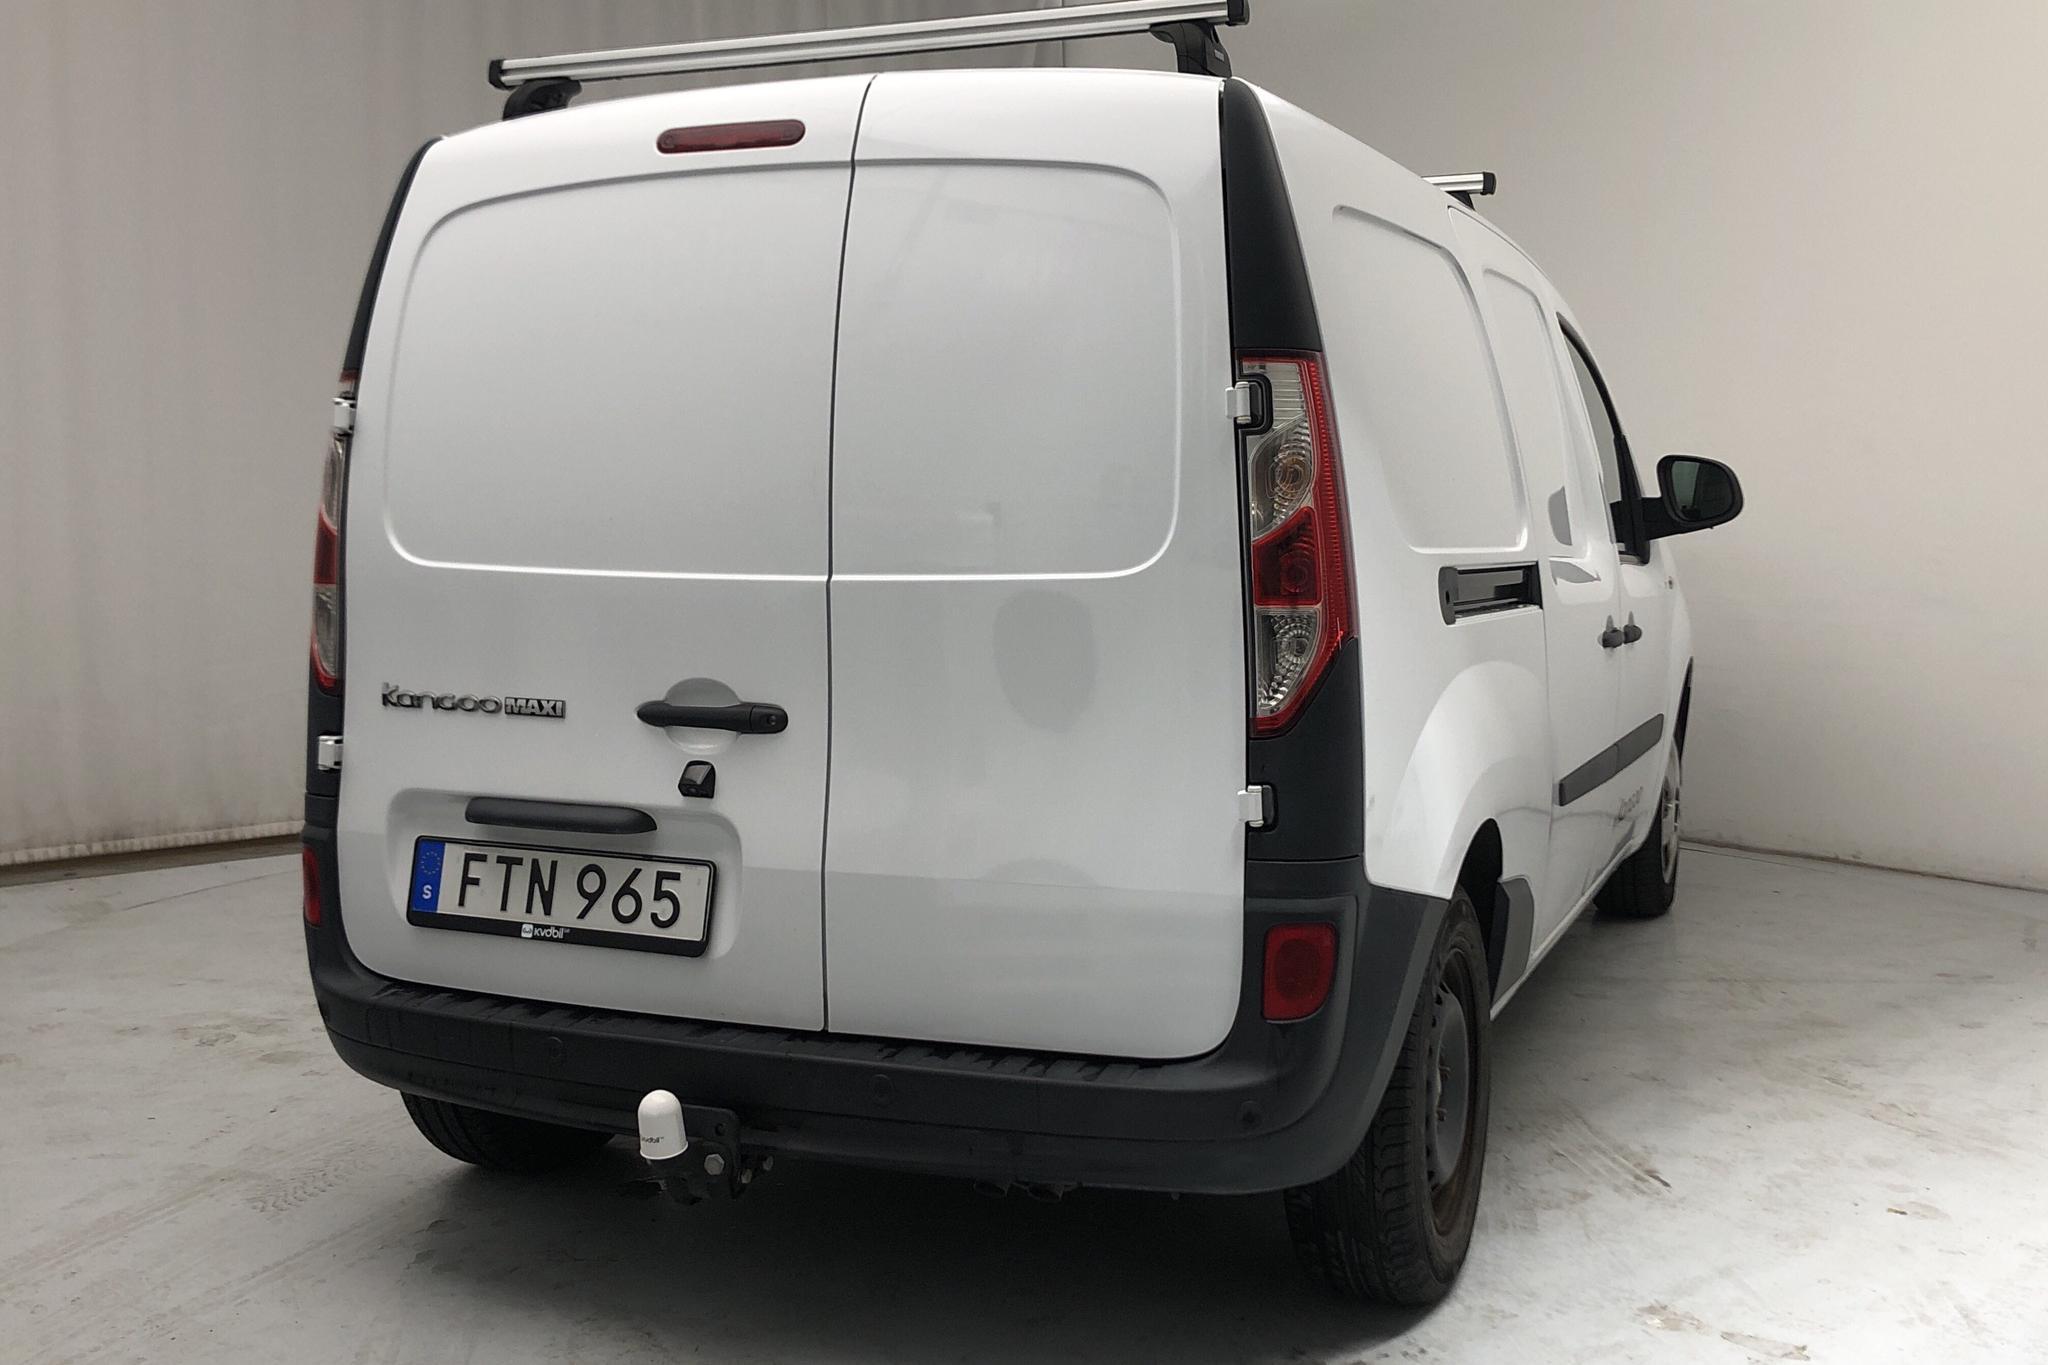 Renault Kangoo 1.5 dCi Maxi Skåp (110hk) - 3 446 mil - Manuell - vit - 2017